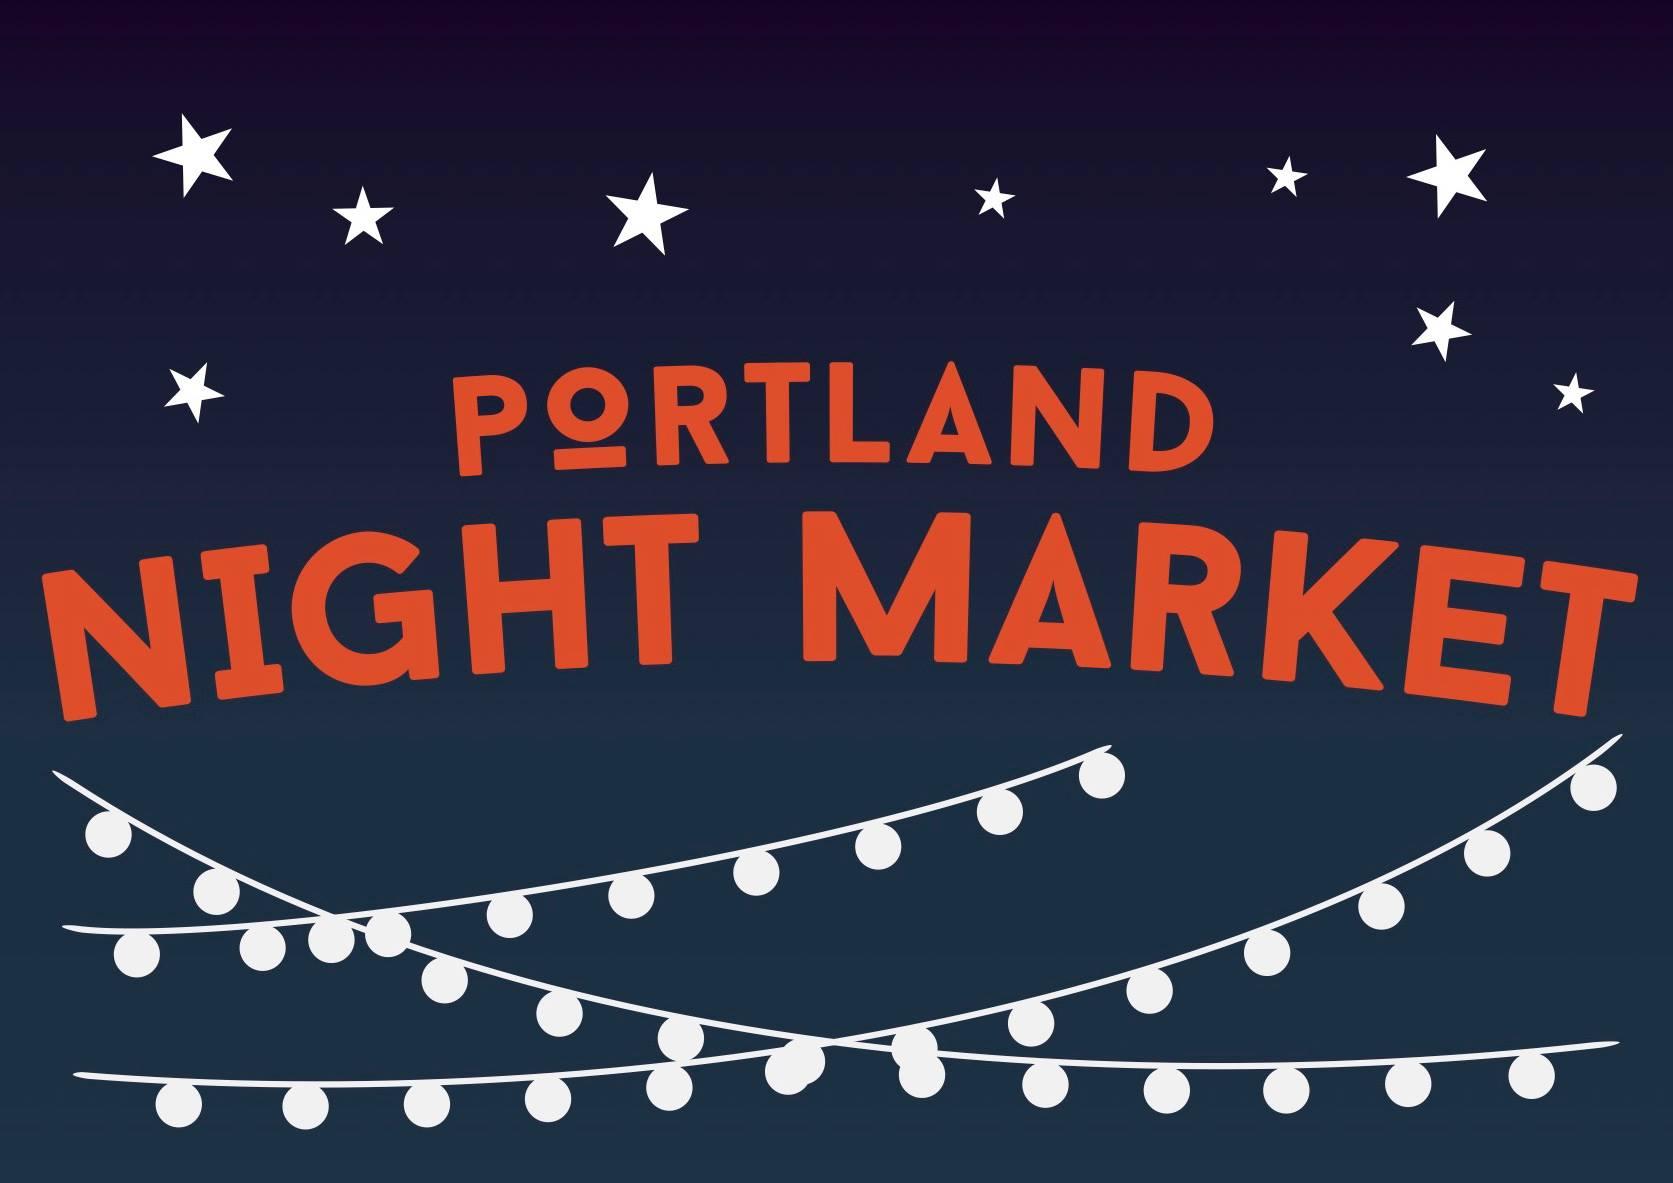 December 14-16 - Custom Blocks900 SE Main St. Portland, ORFriday and Saturday 4pm -11pmSunday 11am - 4pm